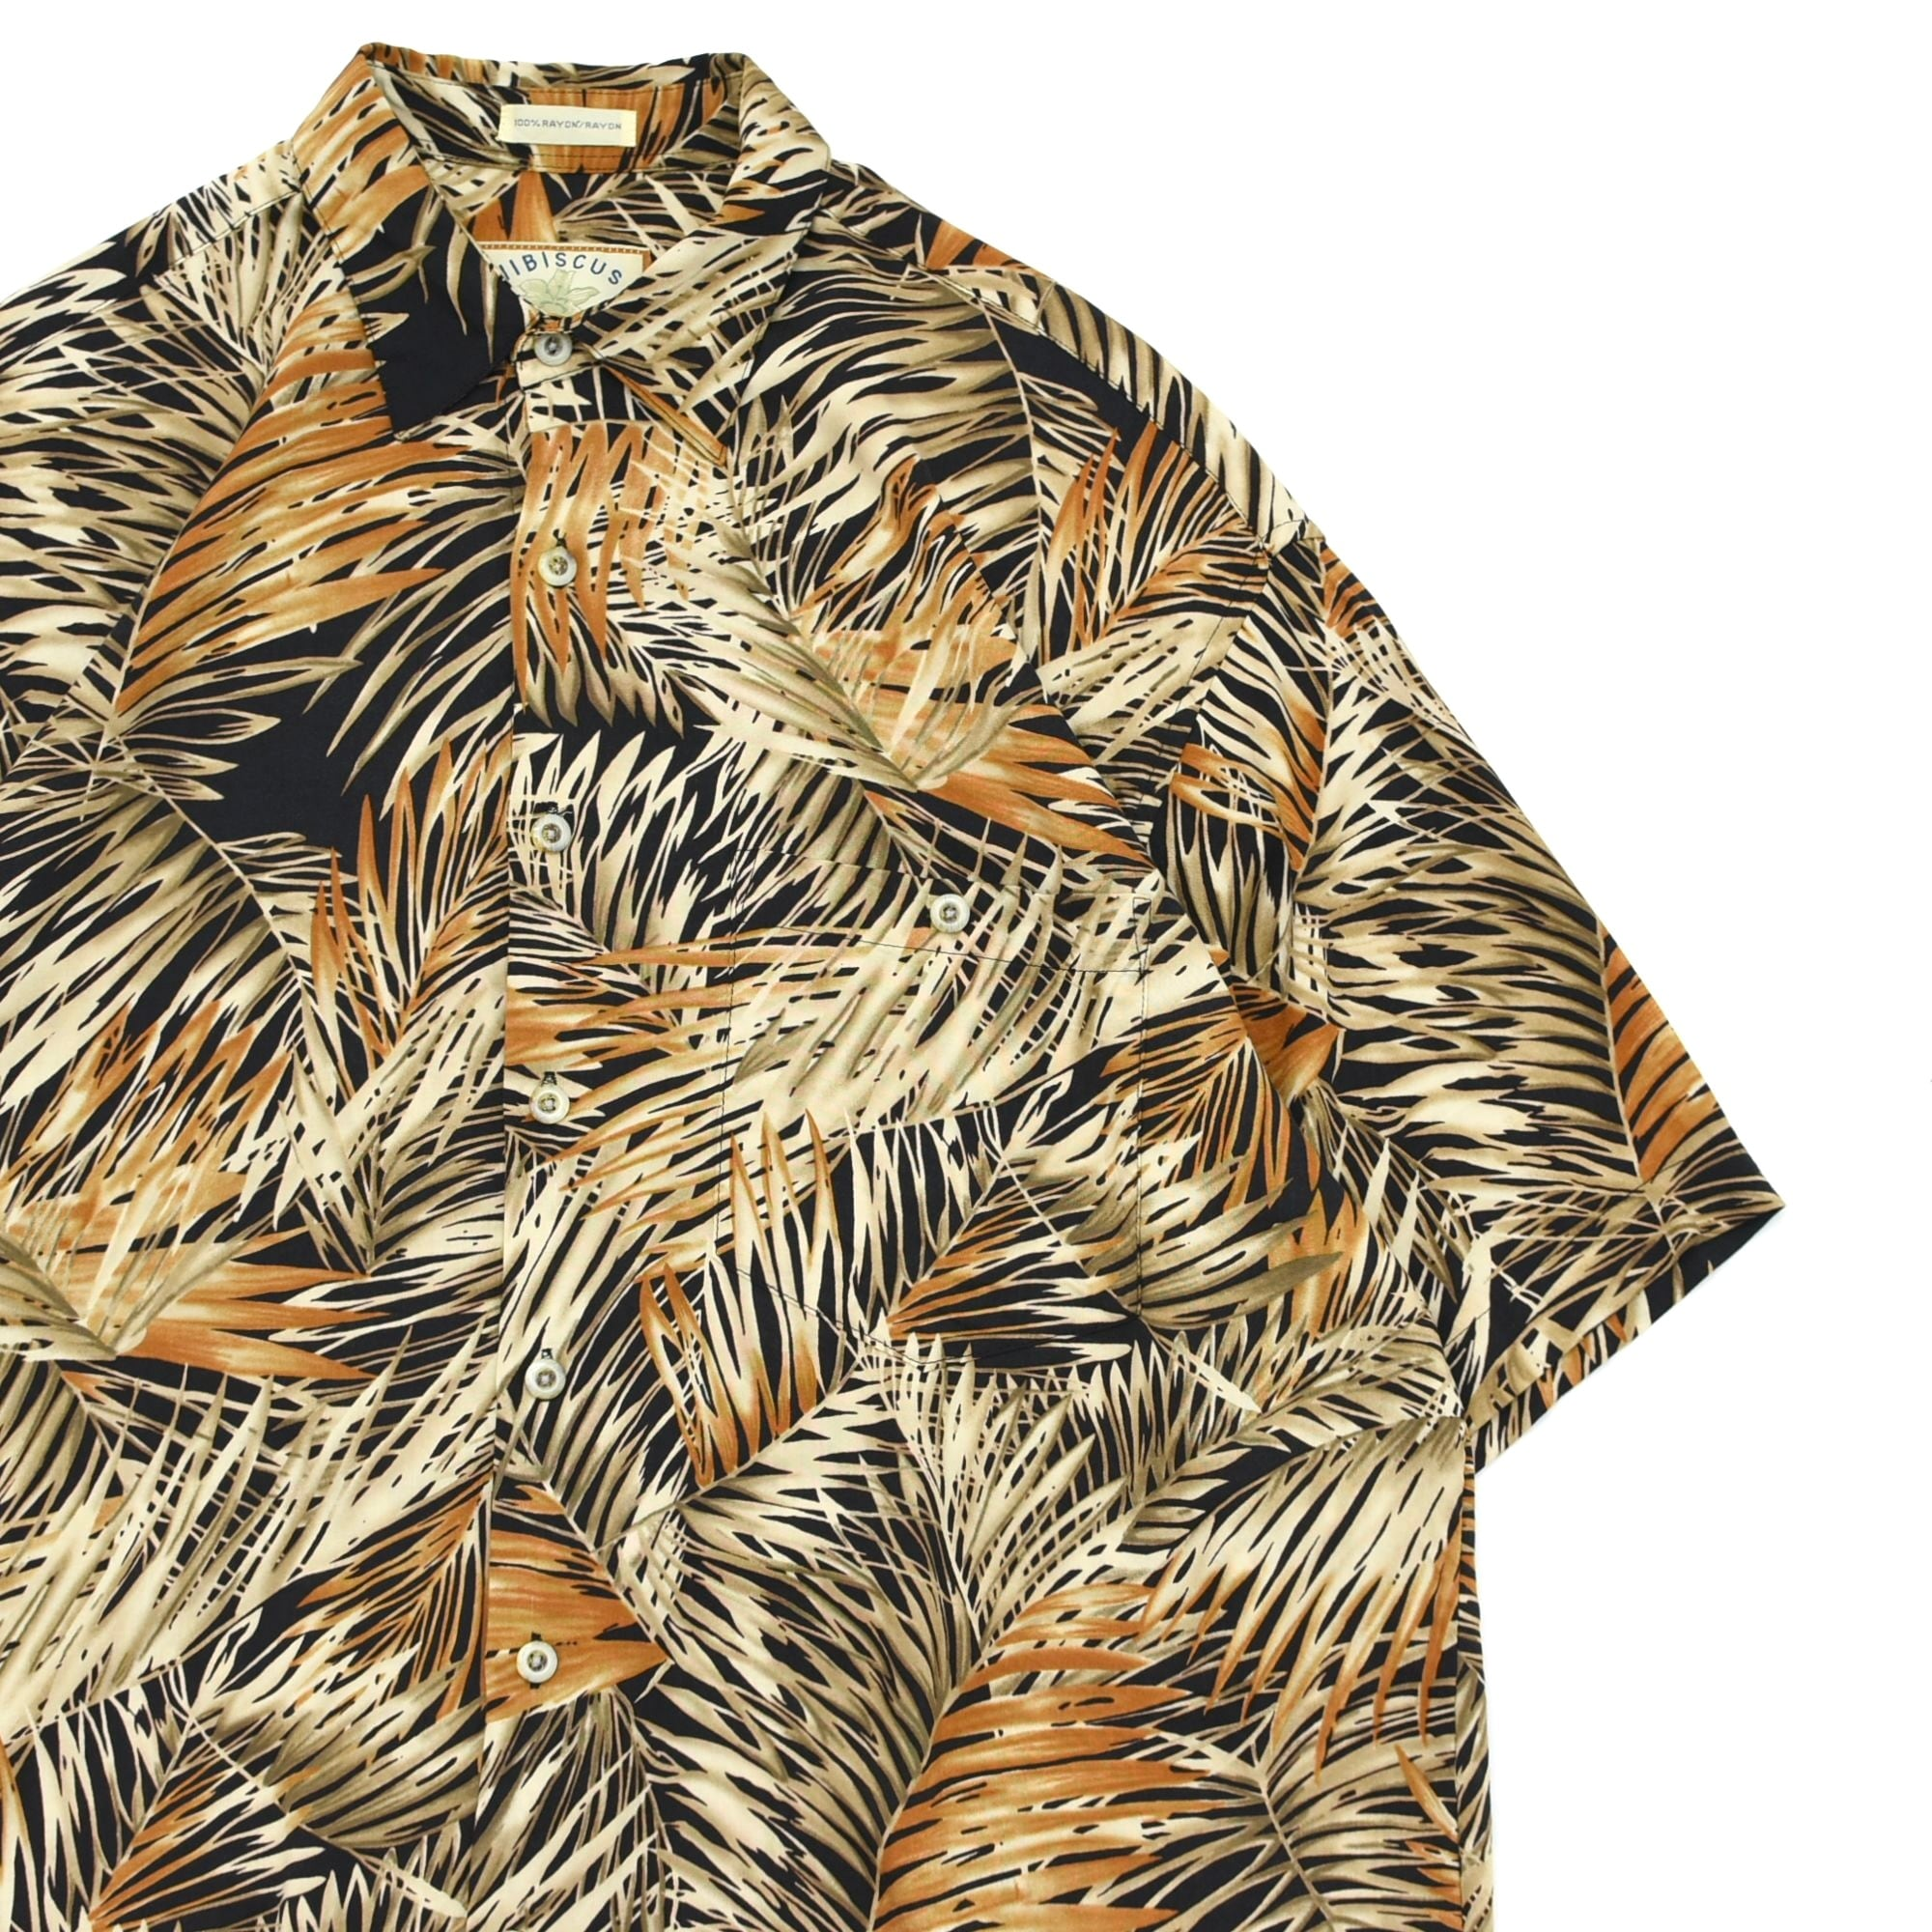 90's HIBISCUS HAWAII rayon aloha shirt